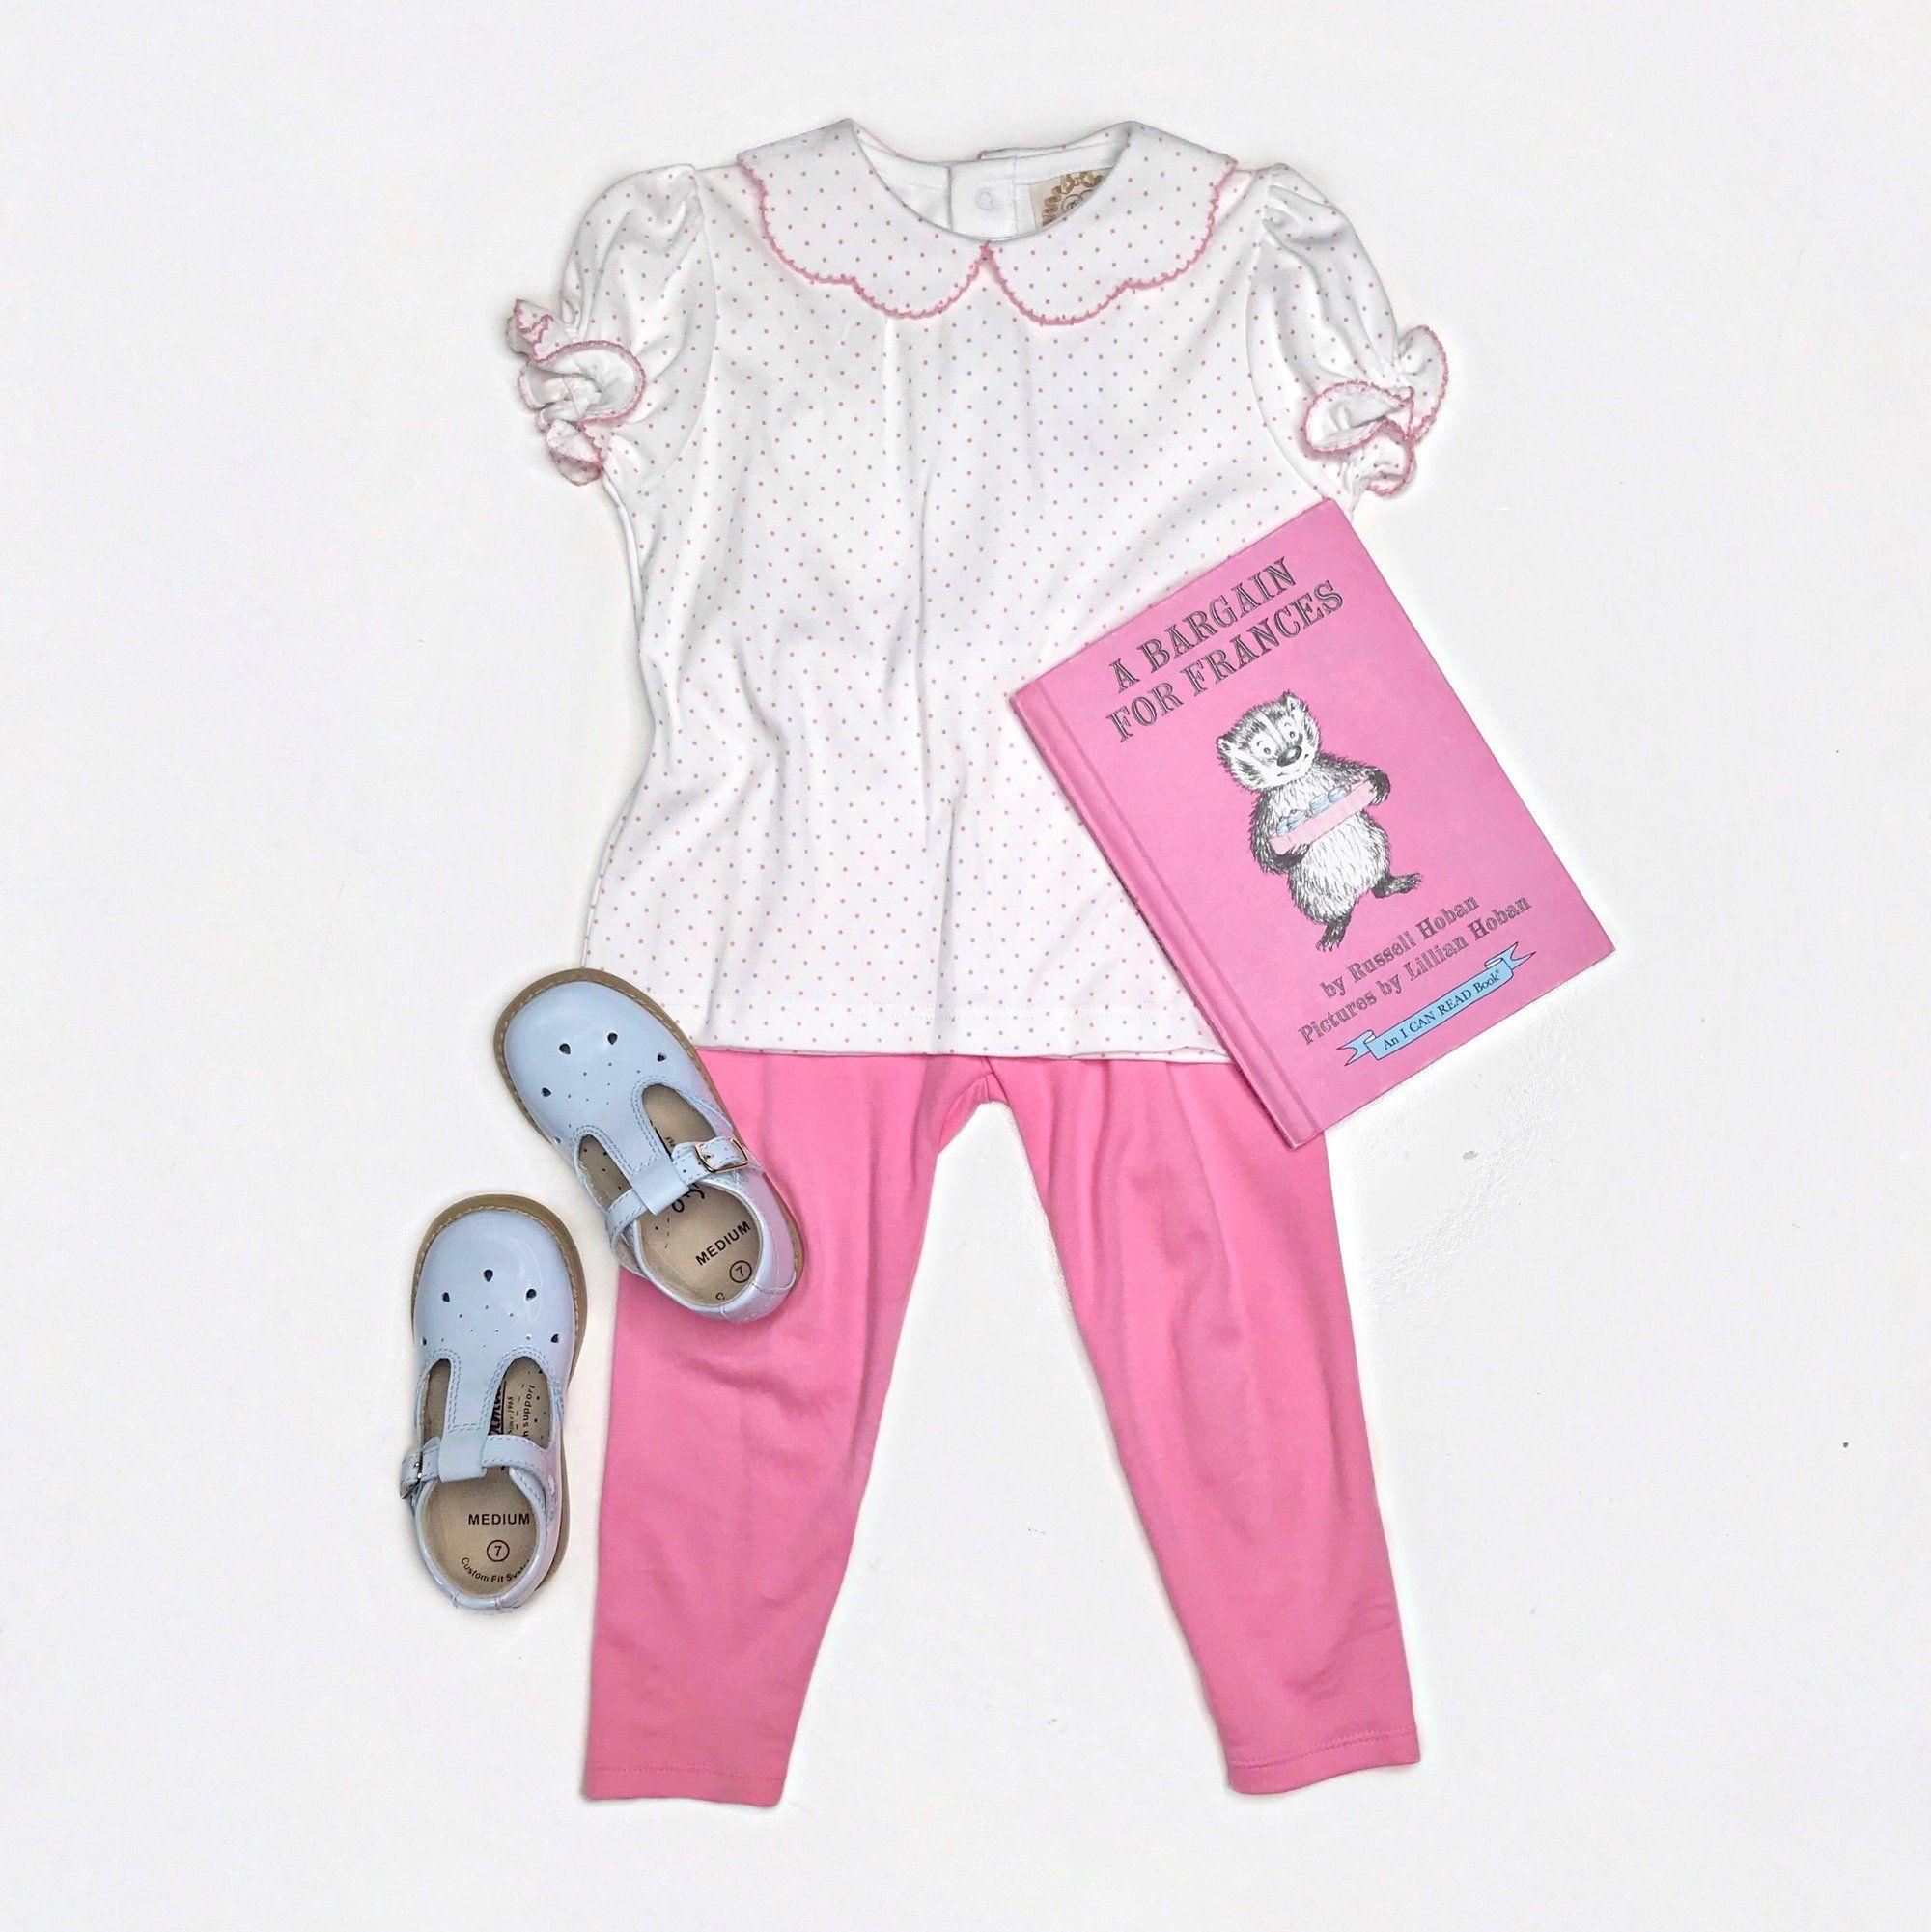 a5eb8ad0ef35 Maude's Peter Pan Collar Shirt - White Short Sleeve Pima with Hamptons -  The Beaufort Bonnet Company